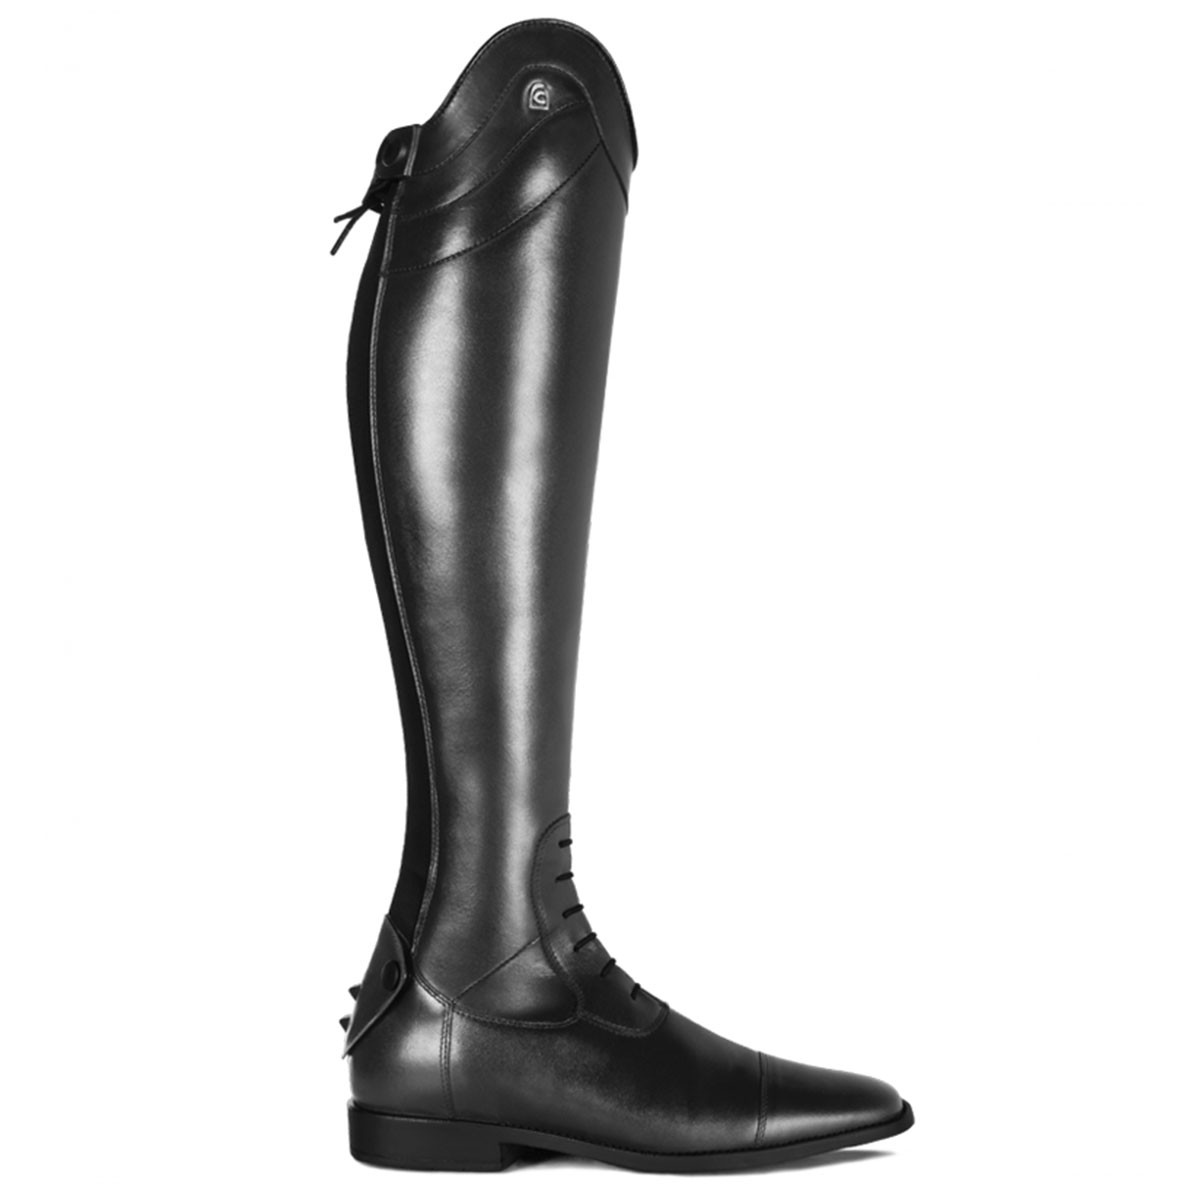 Cavallo Linus Slim rijlaars zwart maat:5-5.5 / h46-w33